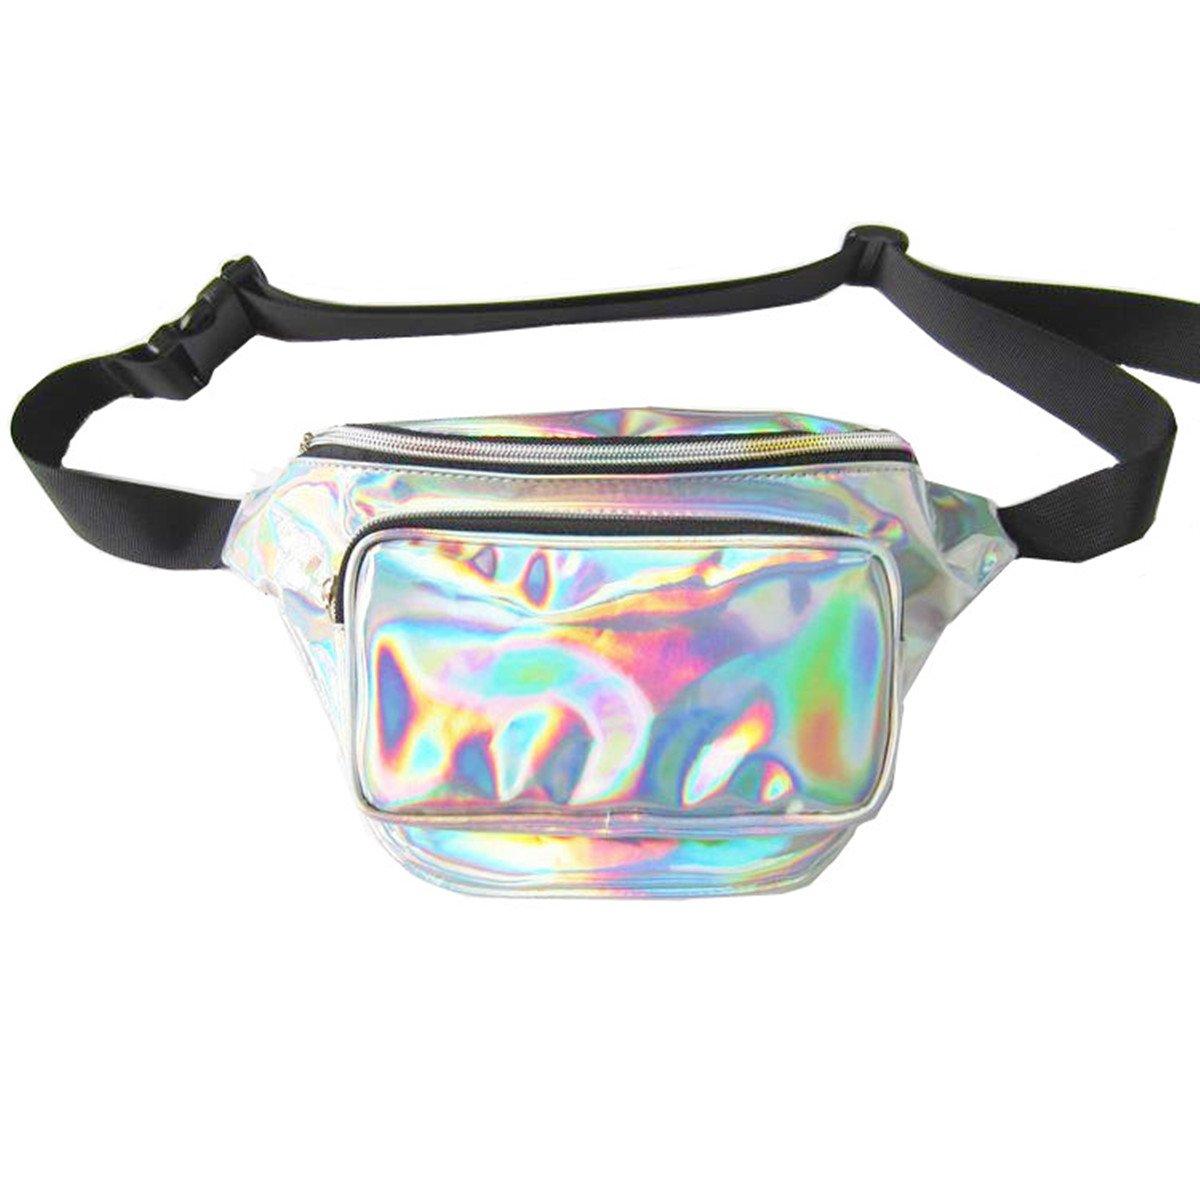 andear Shiny Holographic Bumbag実行スポーツハイキング防水Fanny Packウエストバッグレーザーヒップパック  シルバー B07BSVWH91